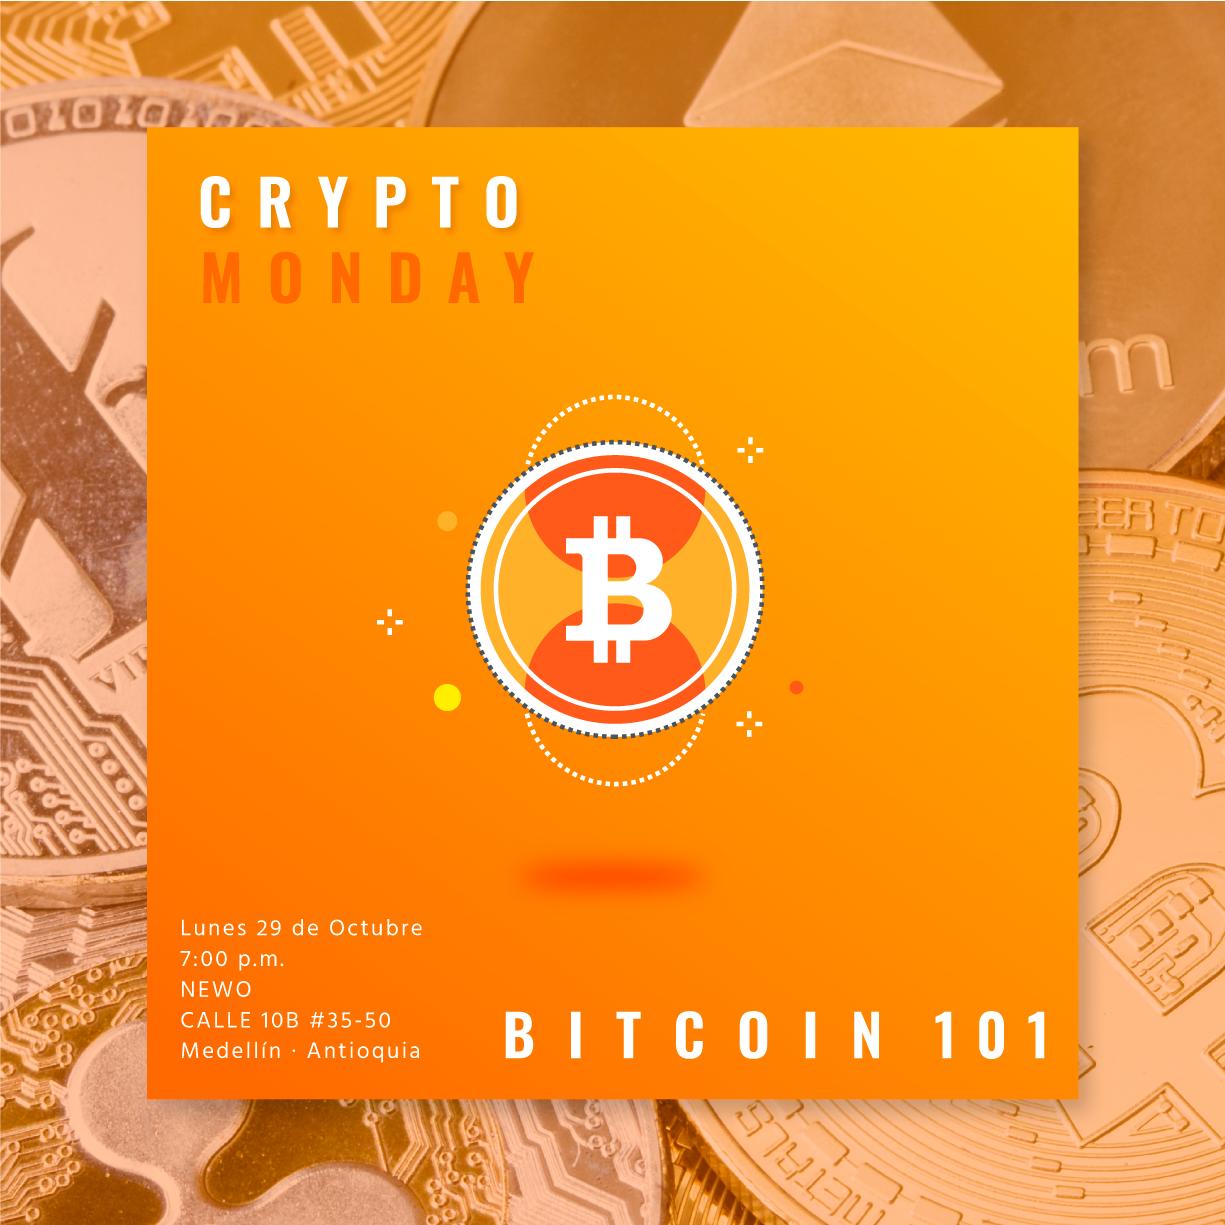 Cryptomondaybitcoin15405051121540505112